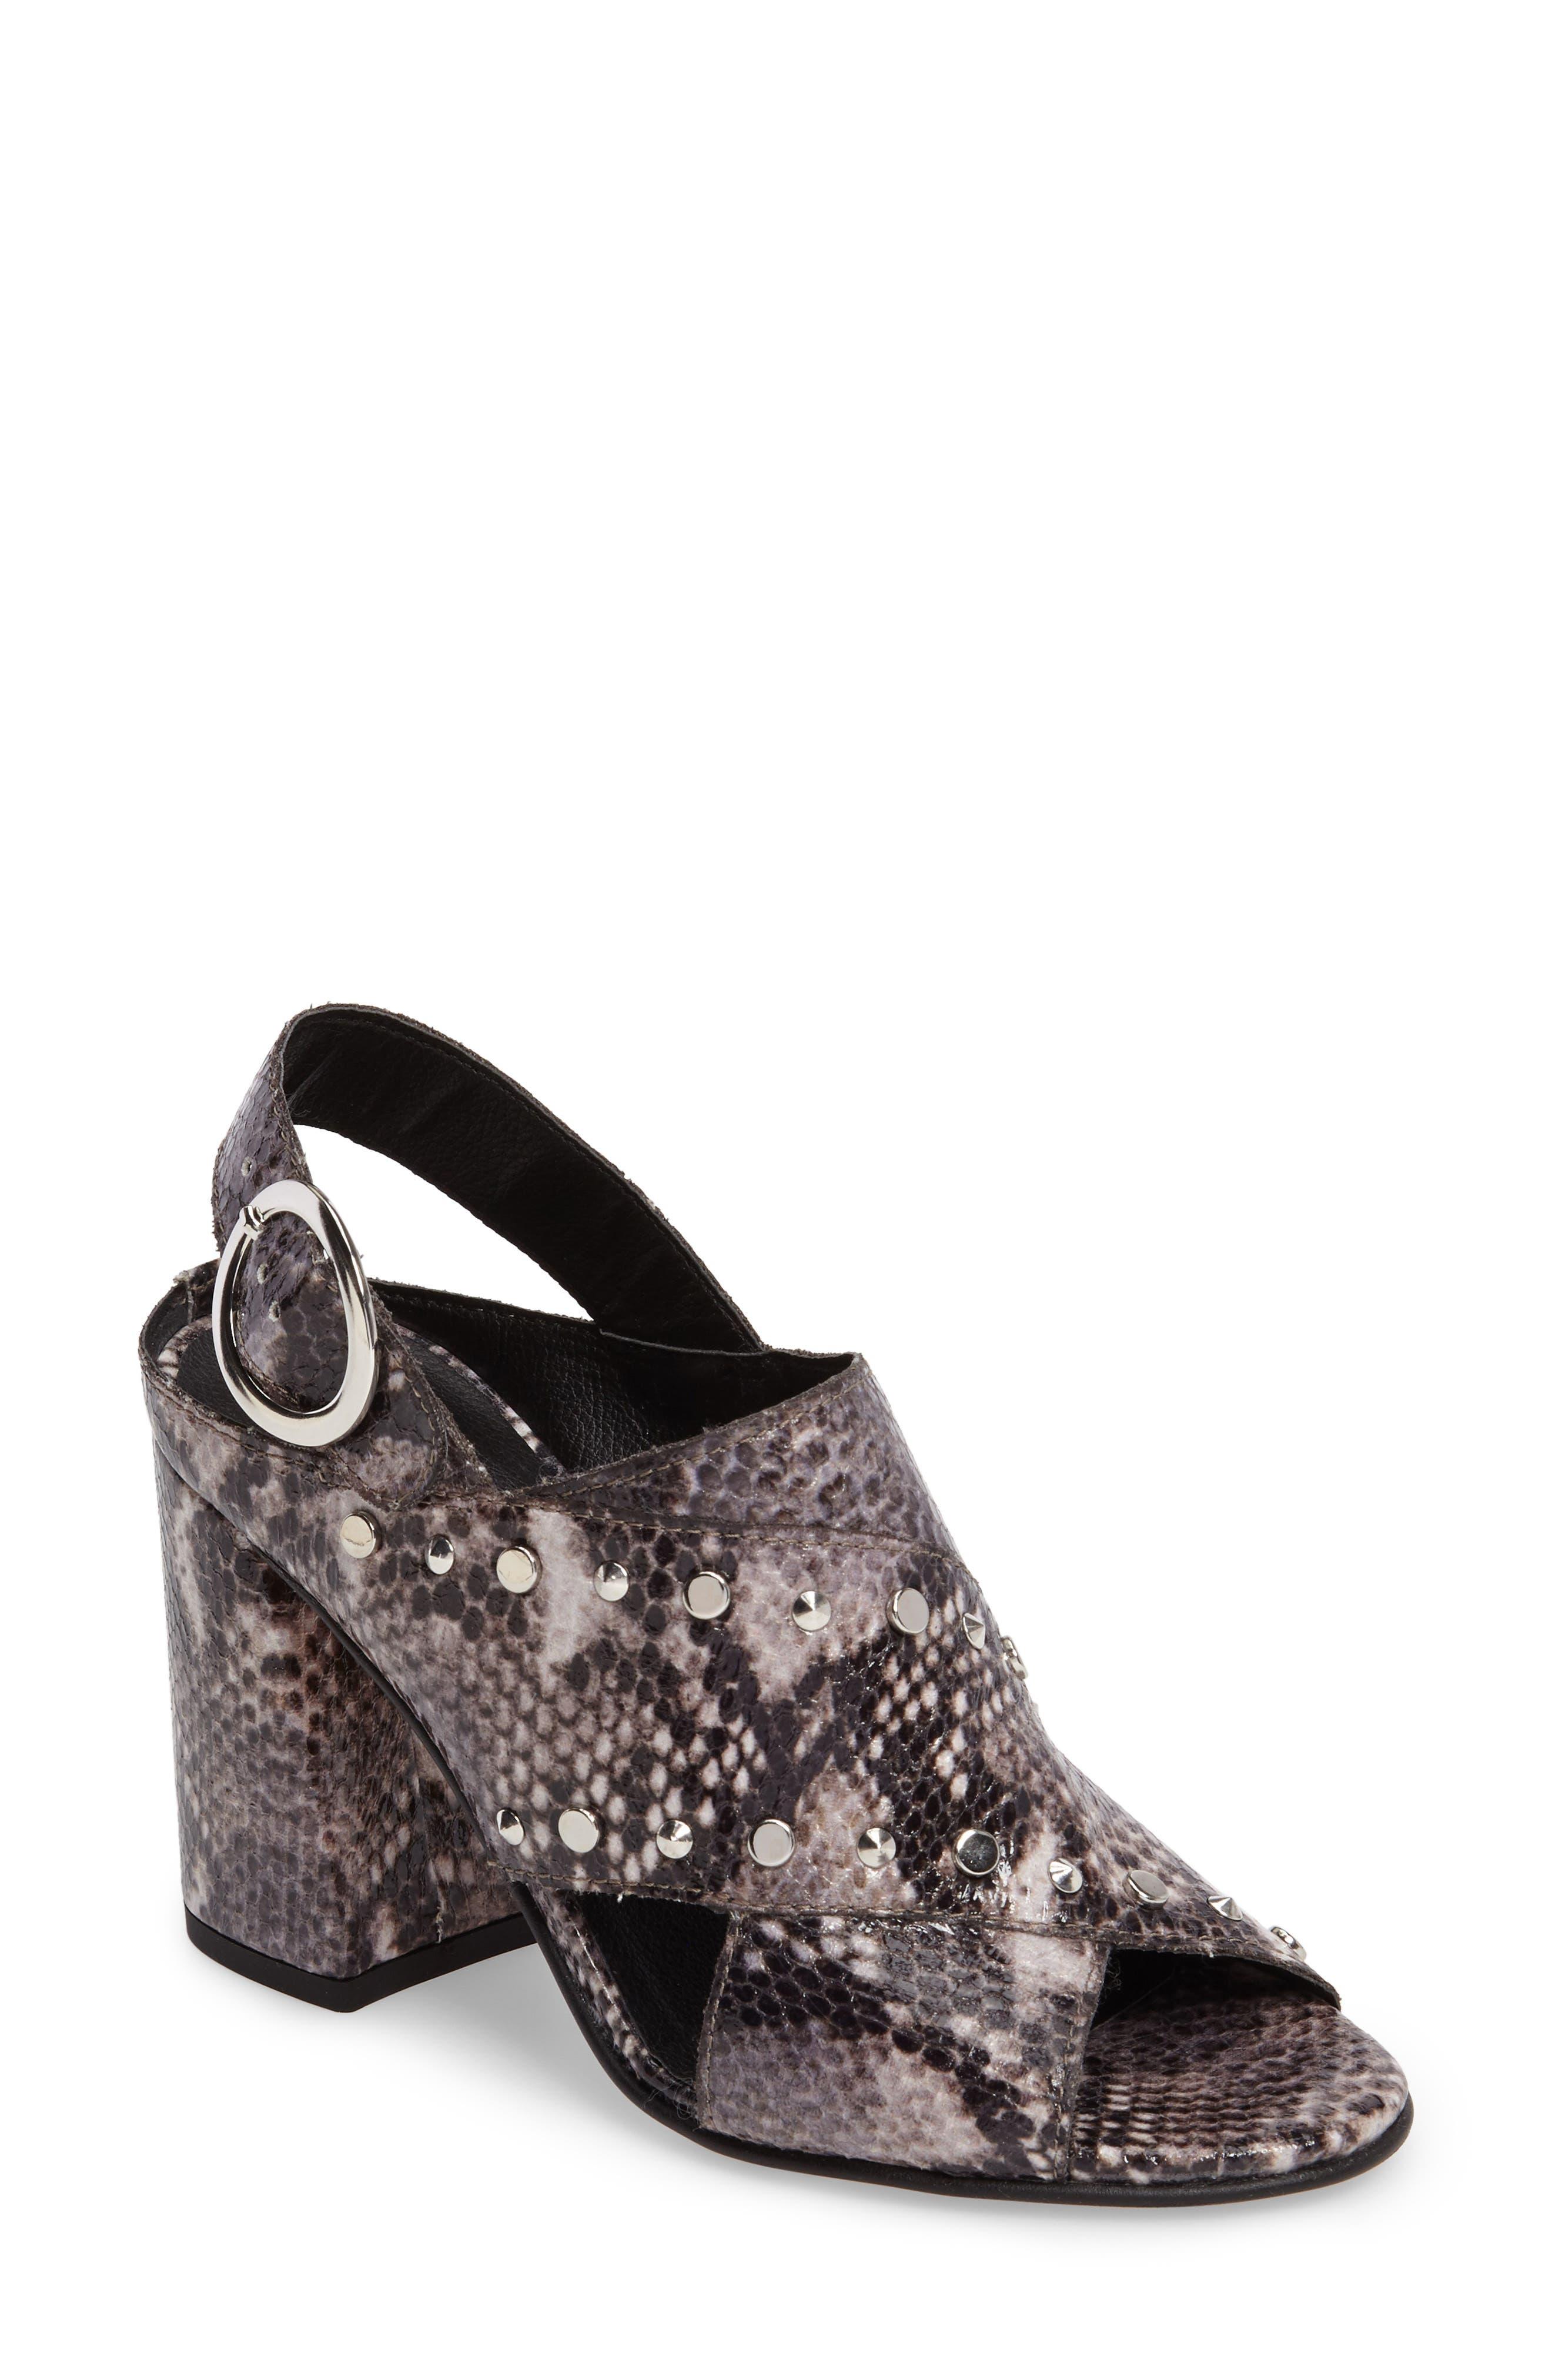 Alternate Image 1 Selected - Topshop Nixie Block Heel Sandal (Women)